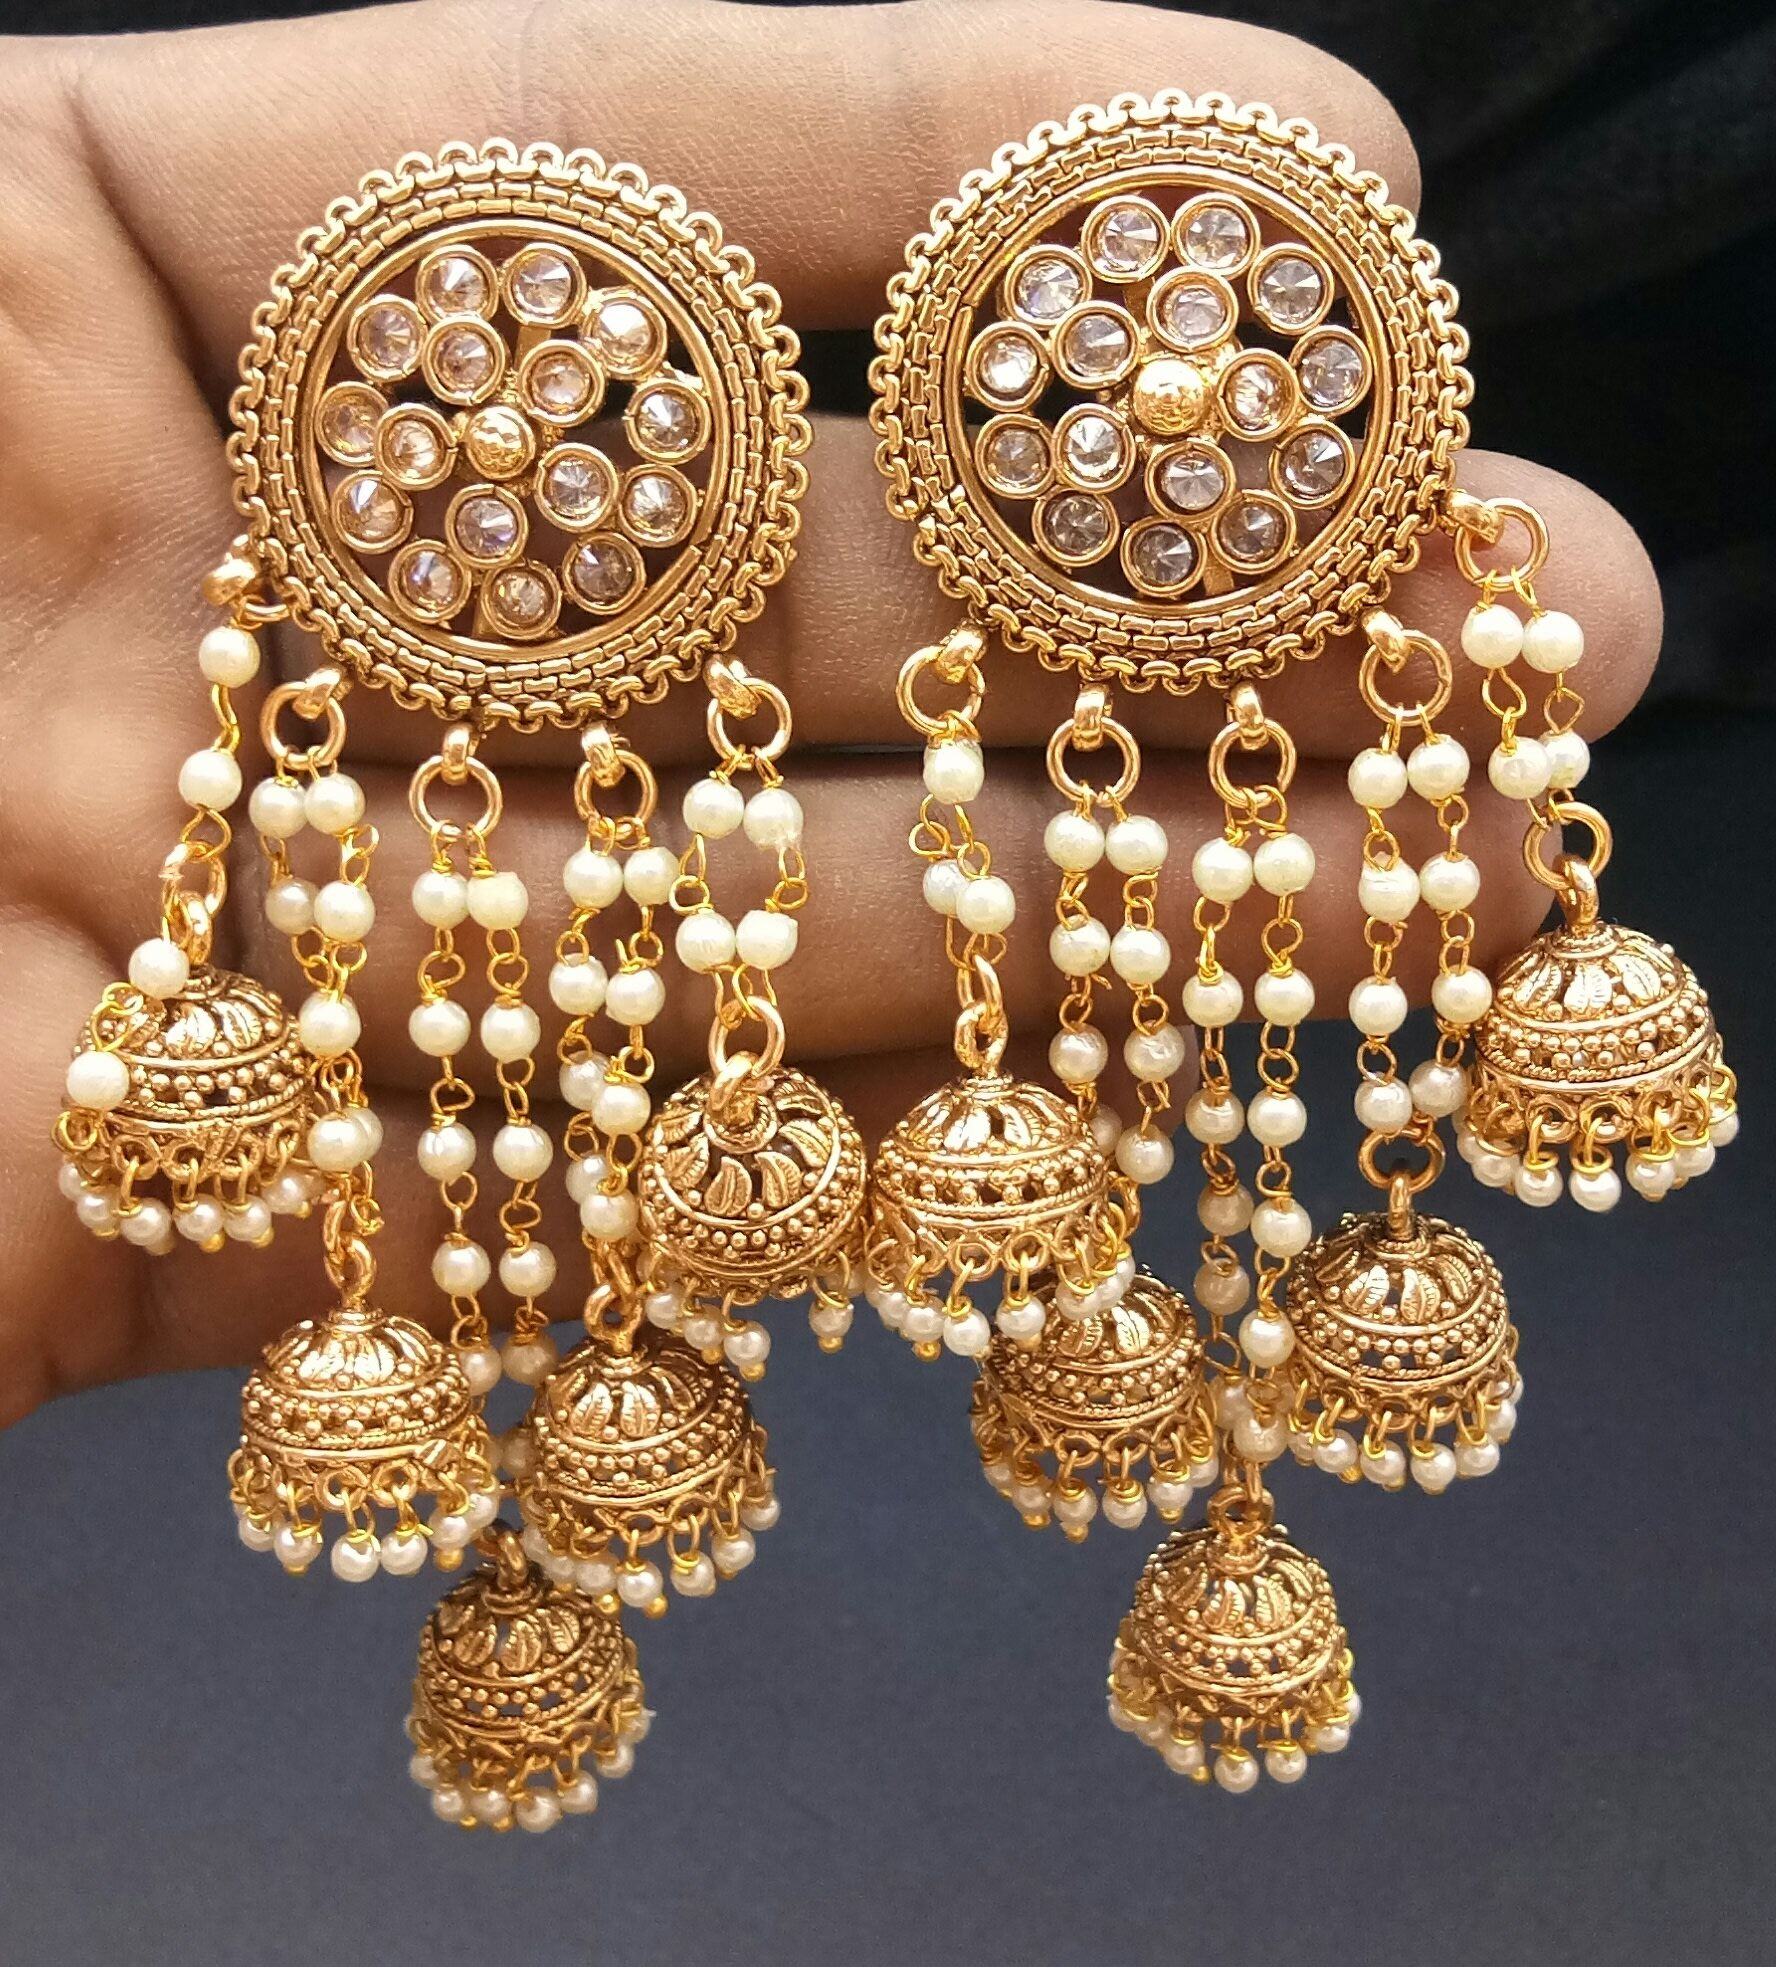 Buy Traditional Jhumka With Pearl Earring Wedding Wear Earring Online 100 Authen Indian Jewellery Design Earrings Fancy Jewellery Bridal Jewellery Earrings